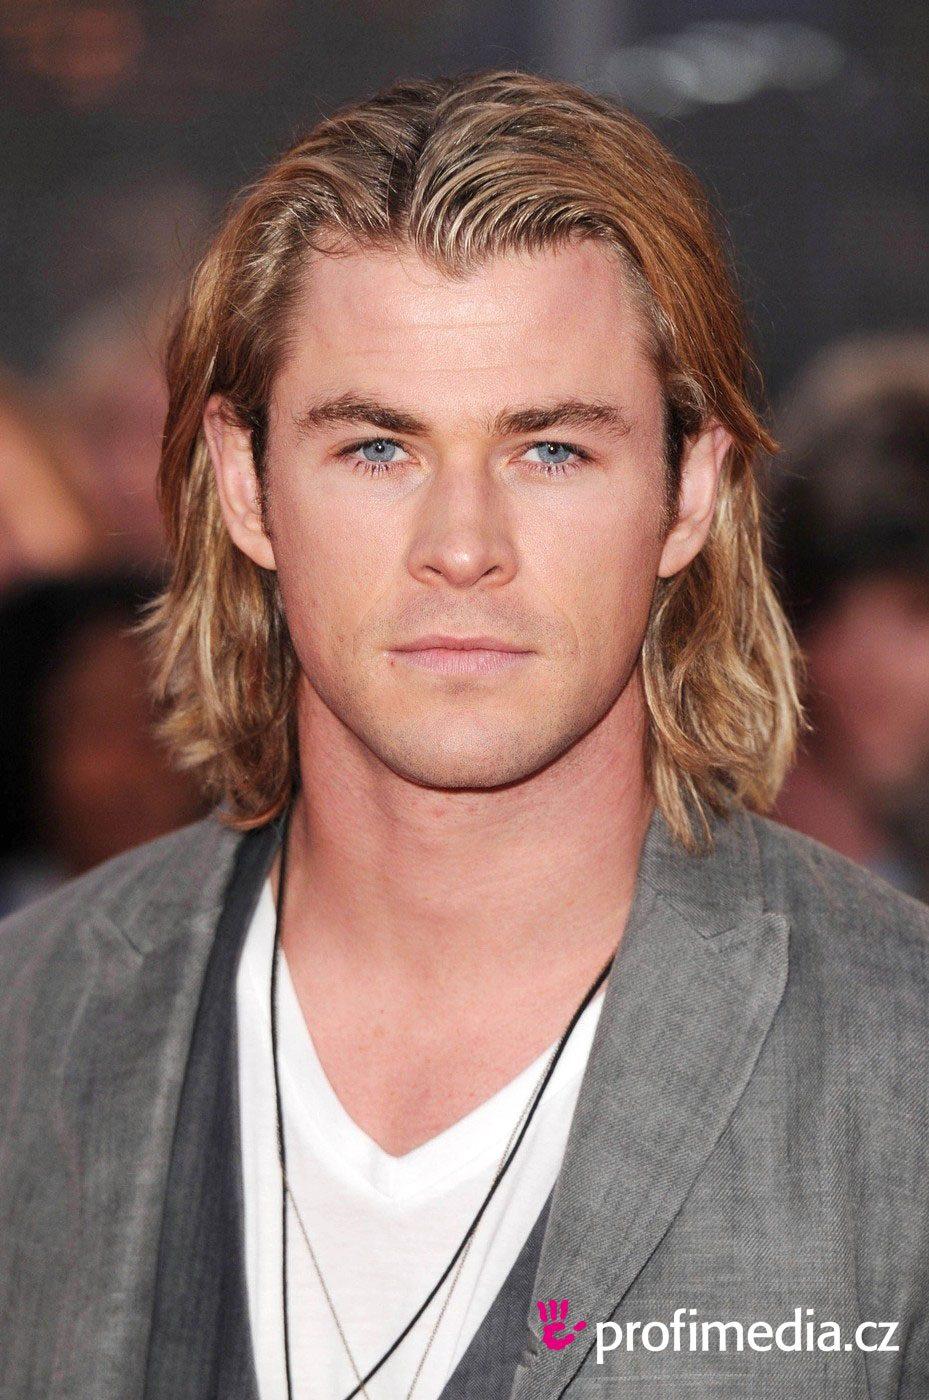 Chris Hemsworth cheveux longs sans barbe